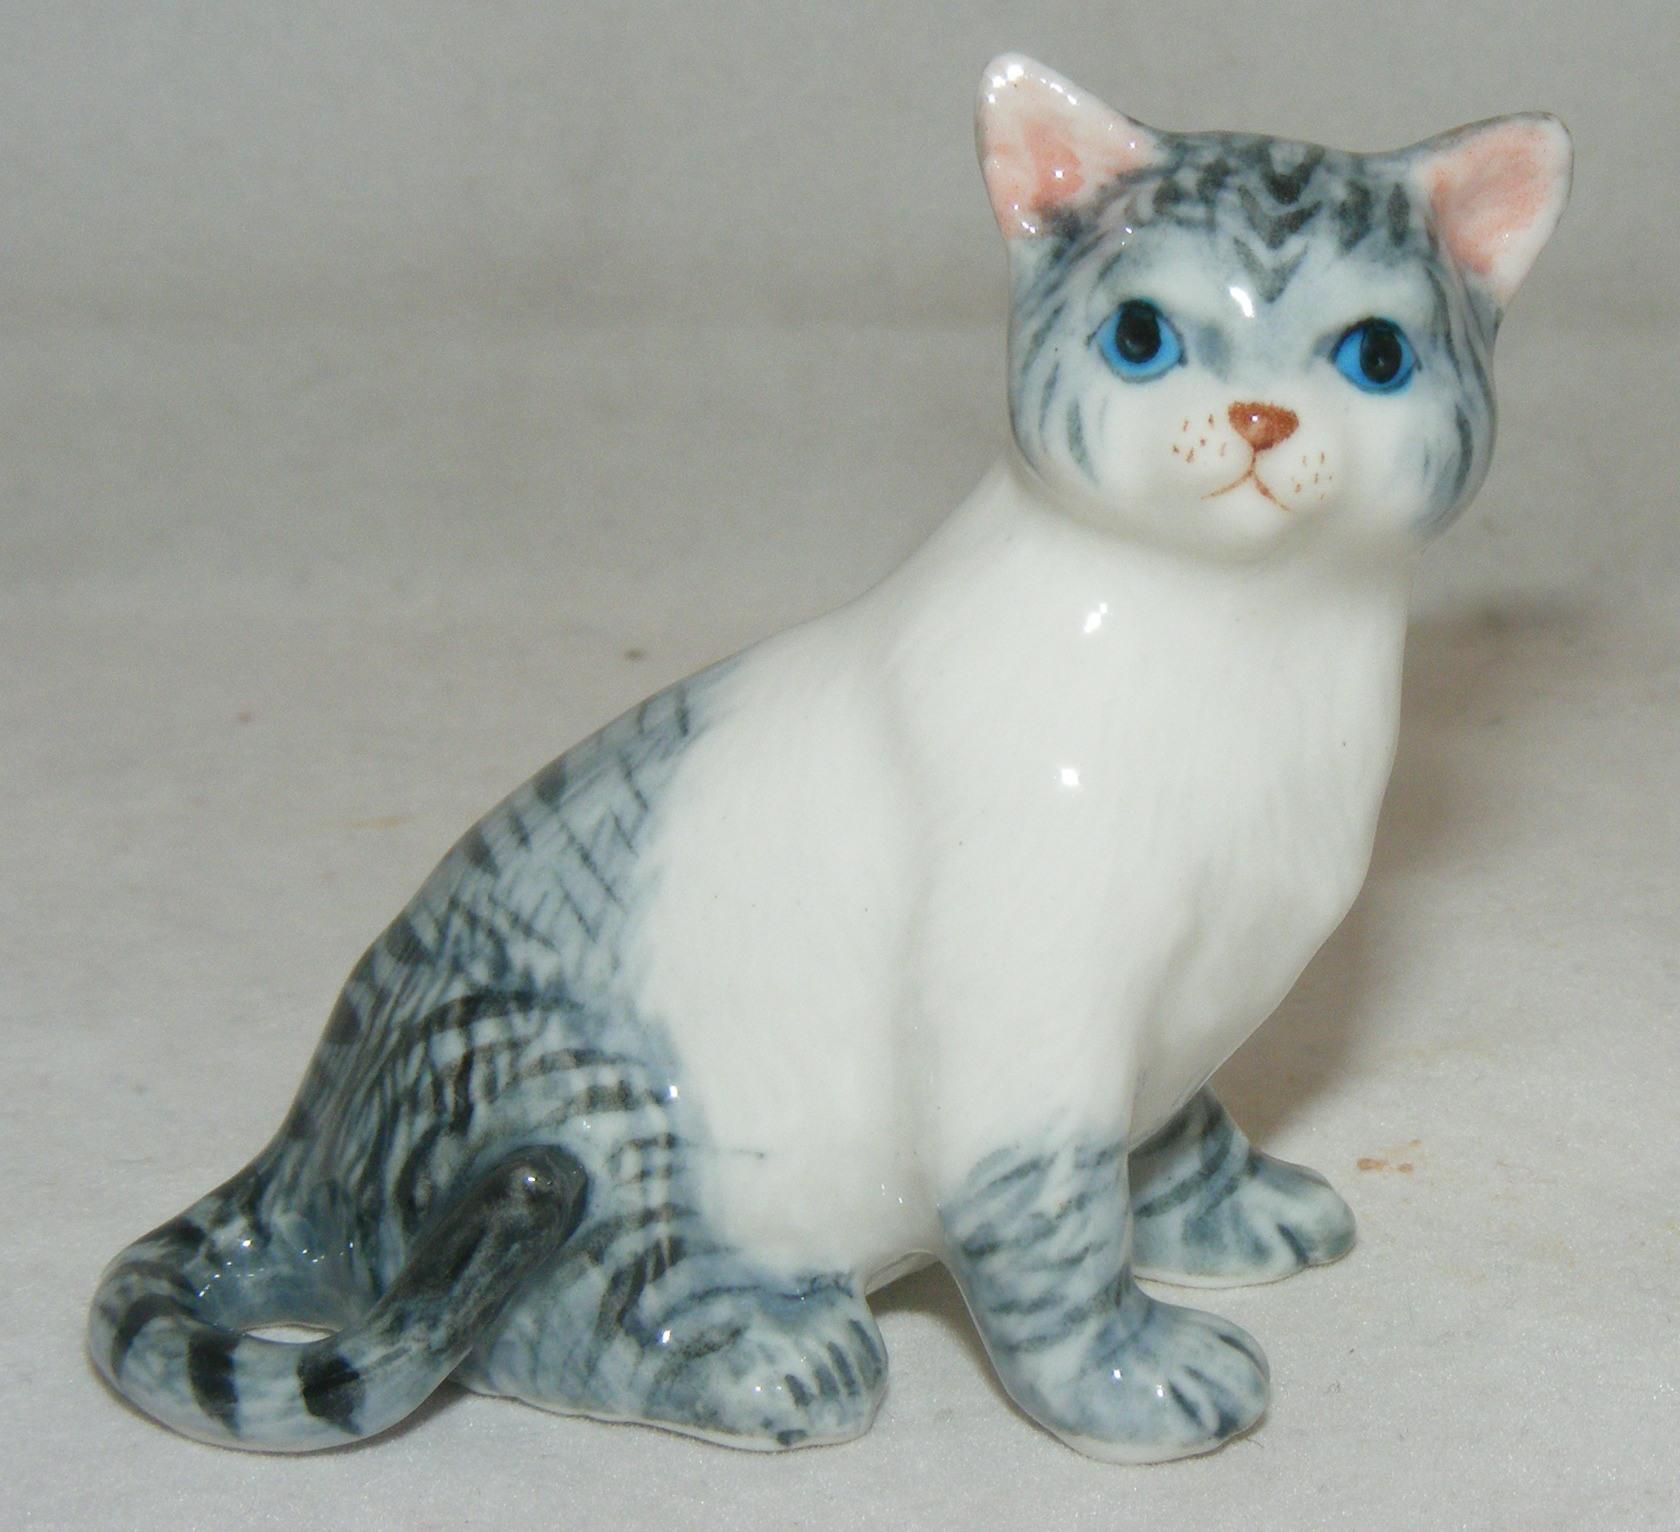 Klima MIniature Porcelain Animal Figure Fat Cat Lying K072